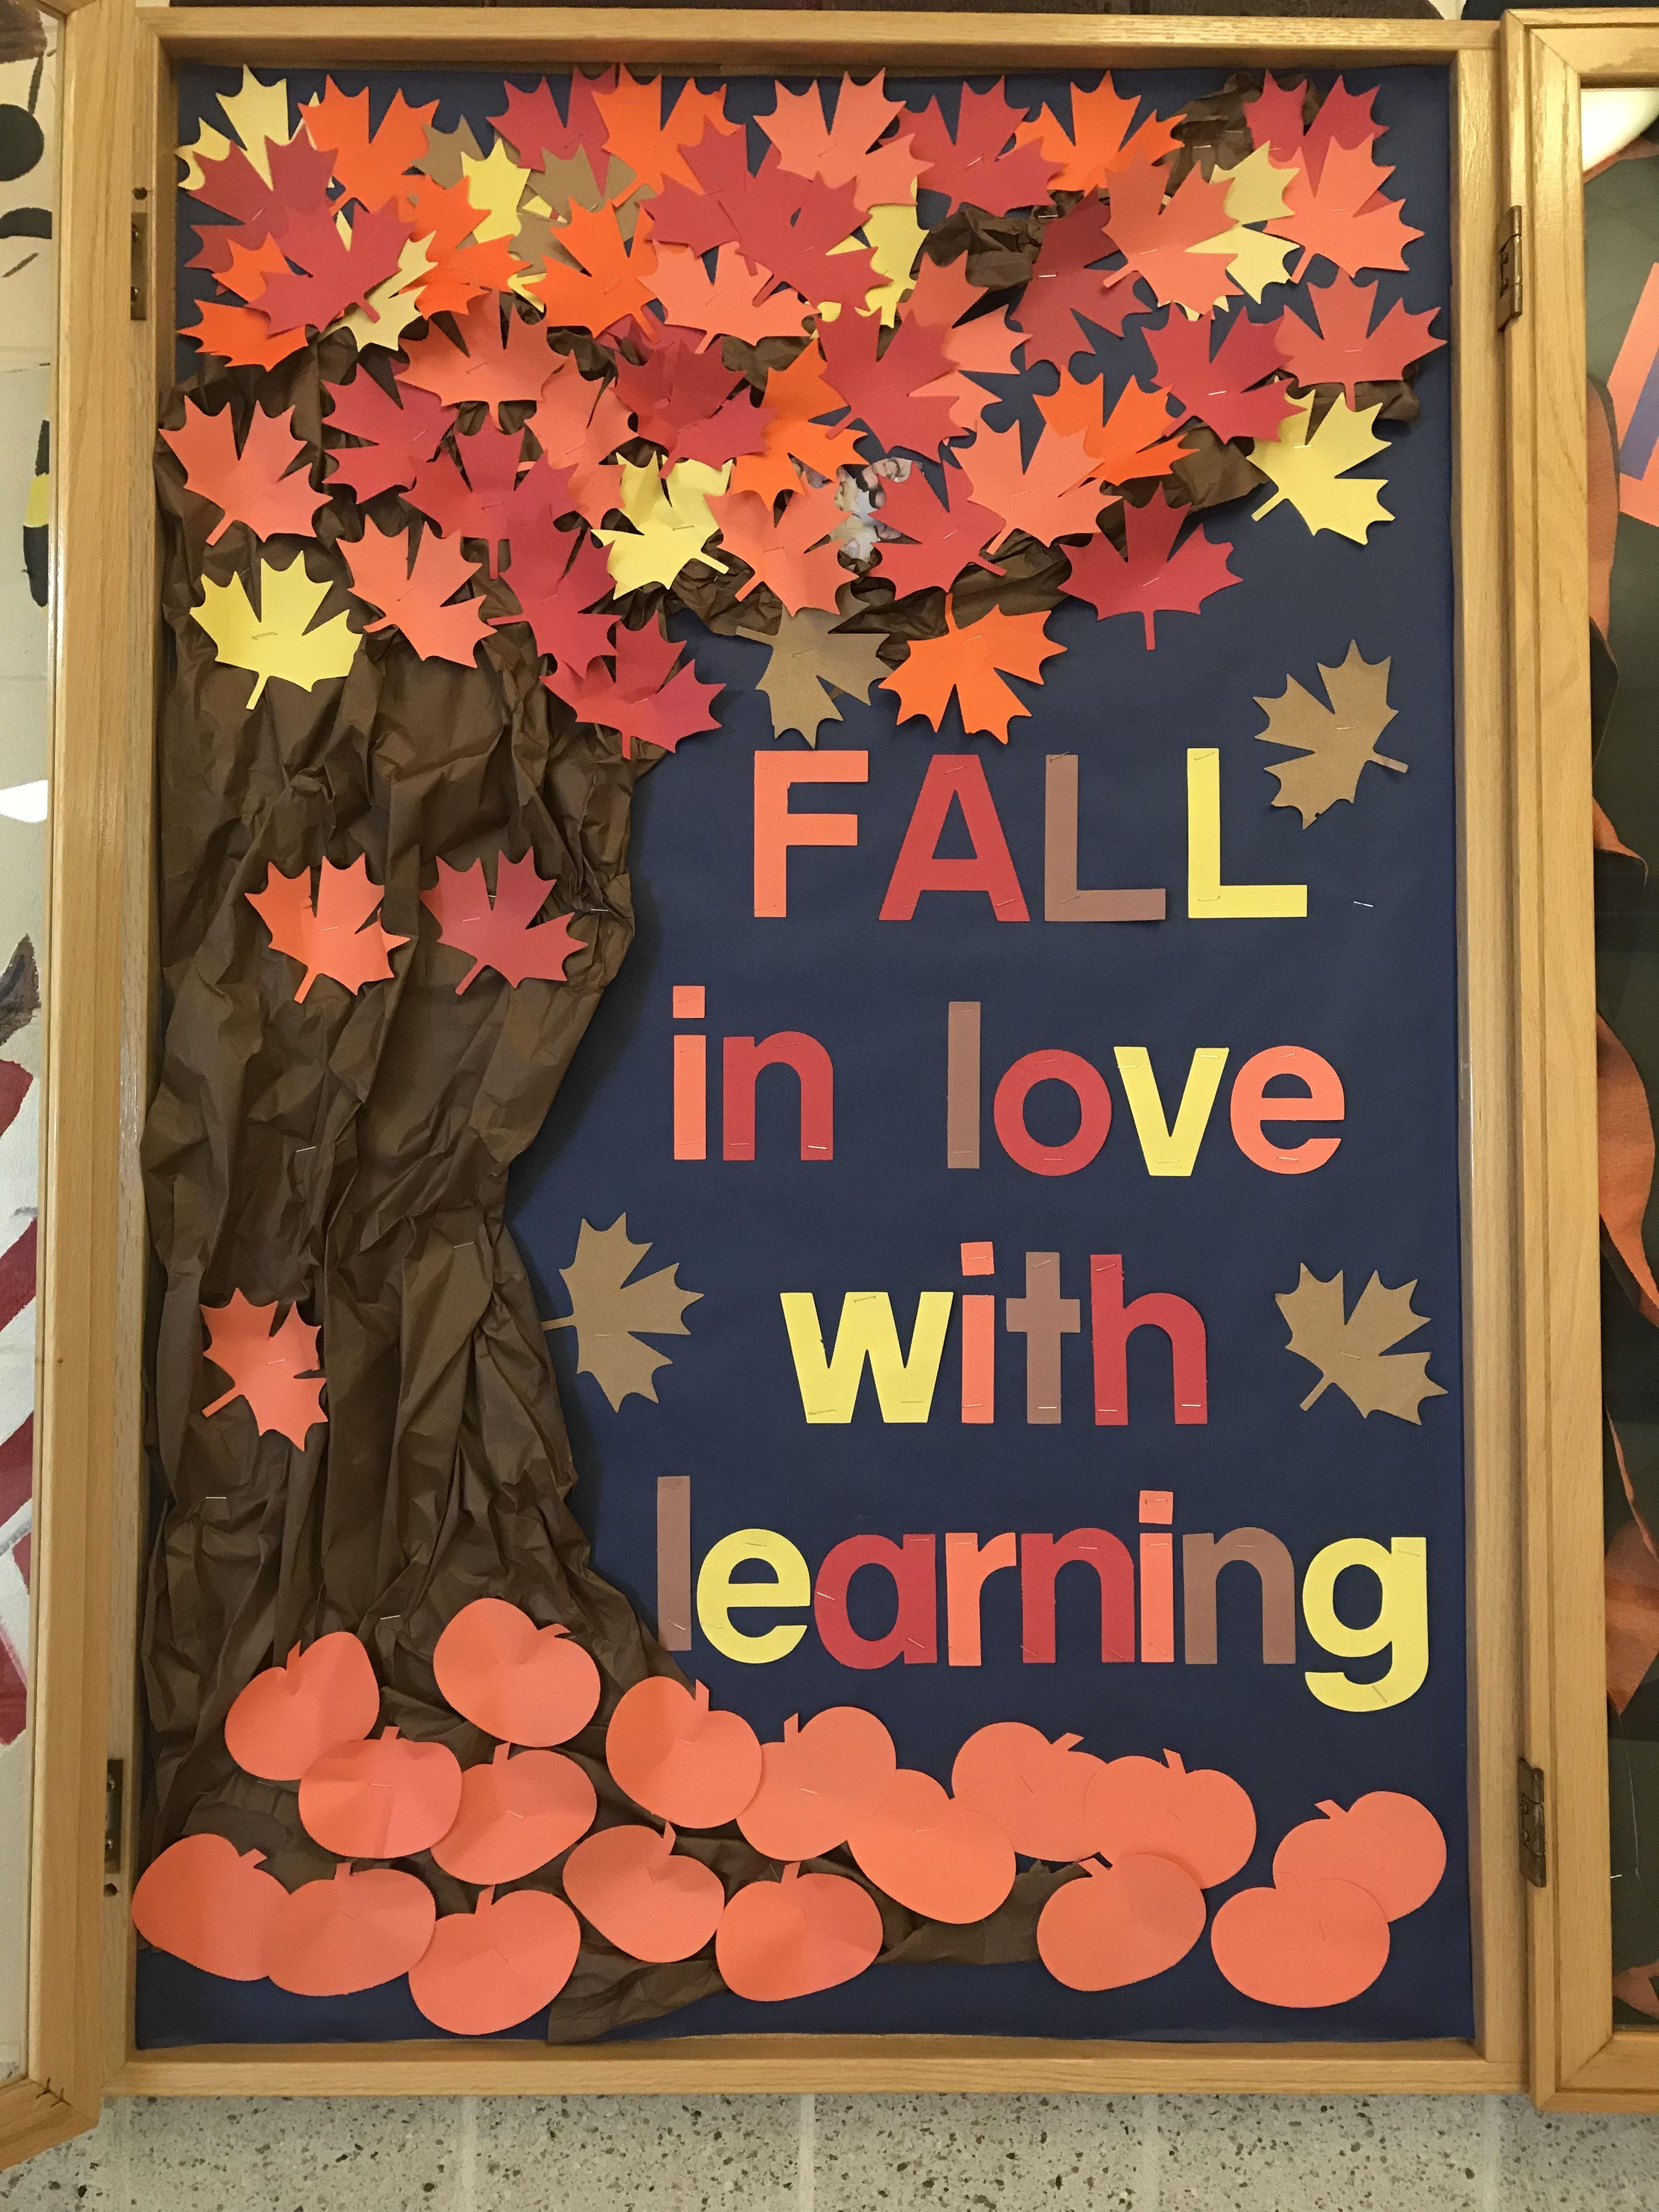 #falldoordecorationsclassroom